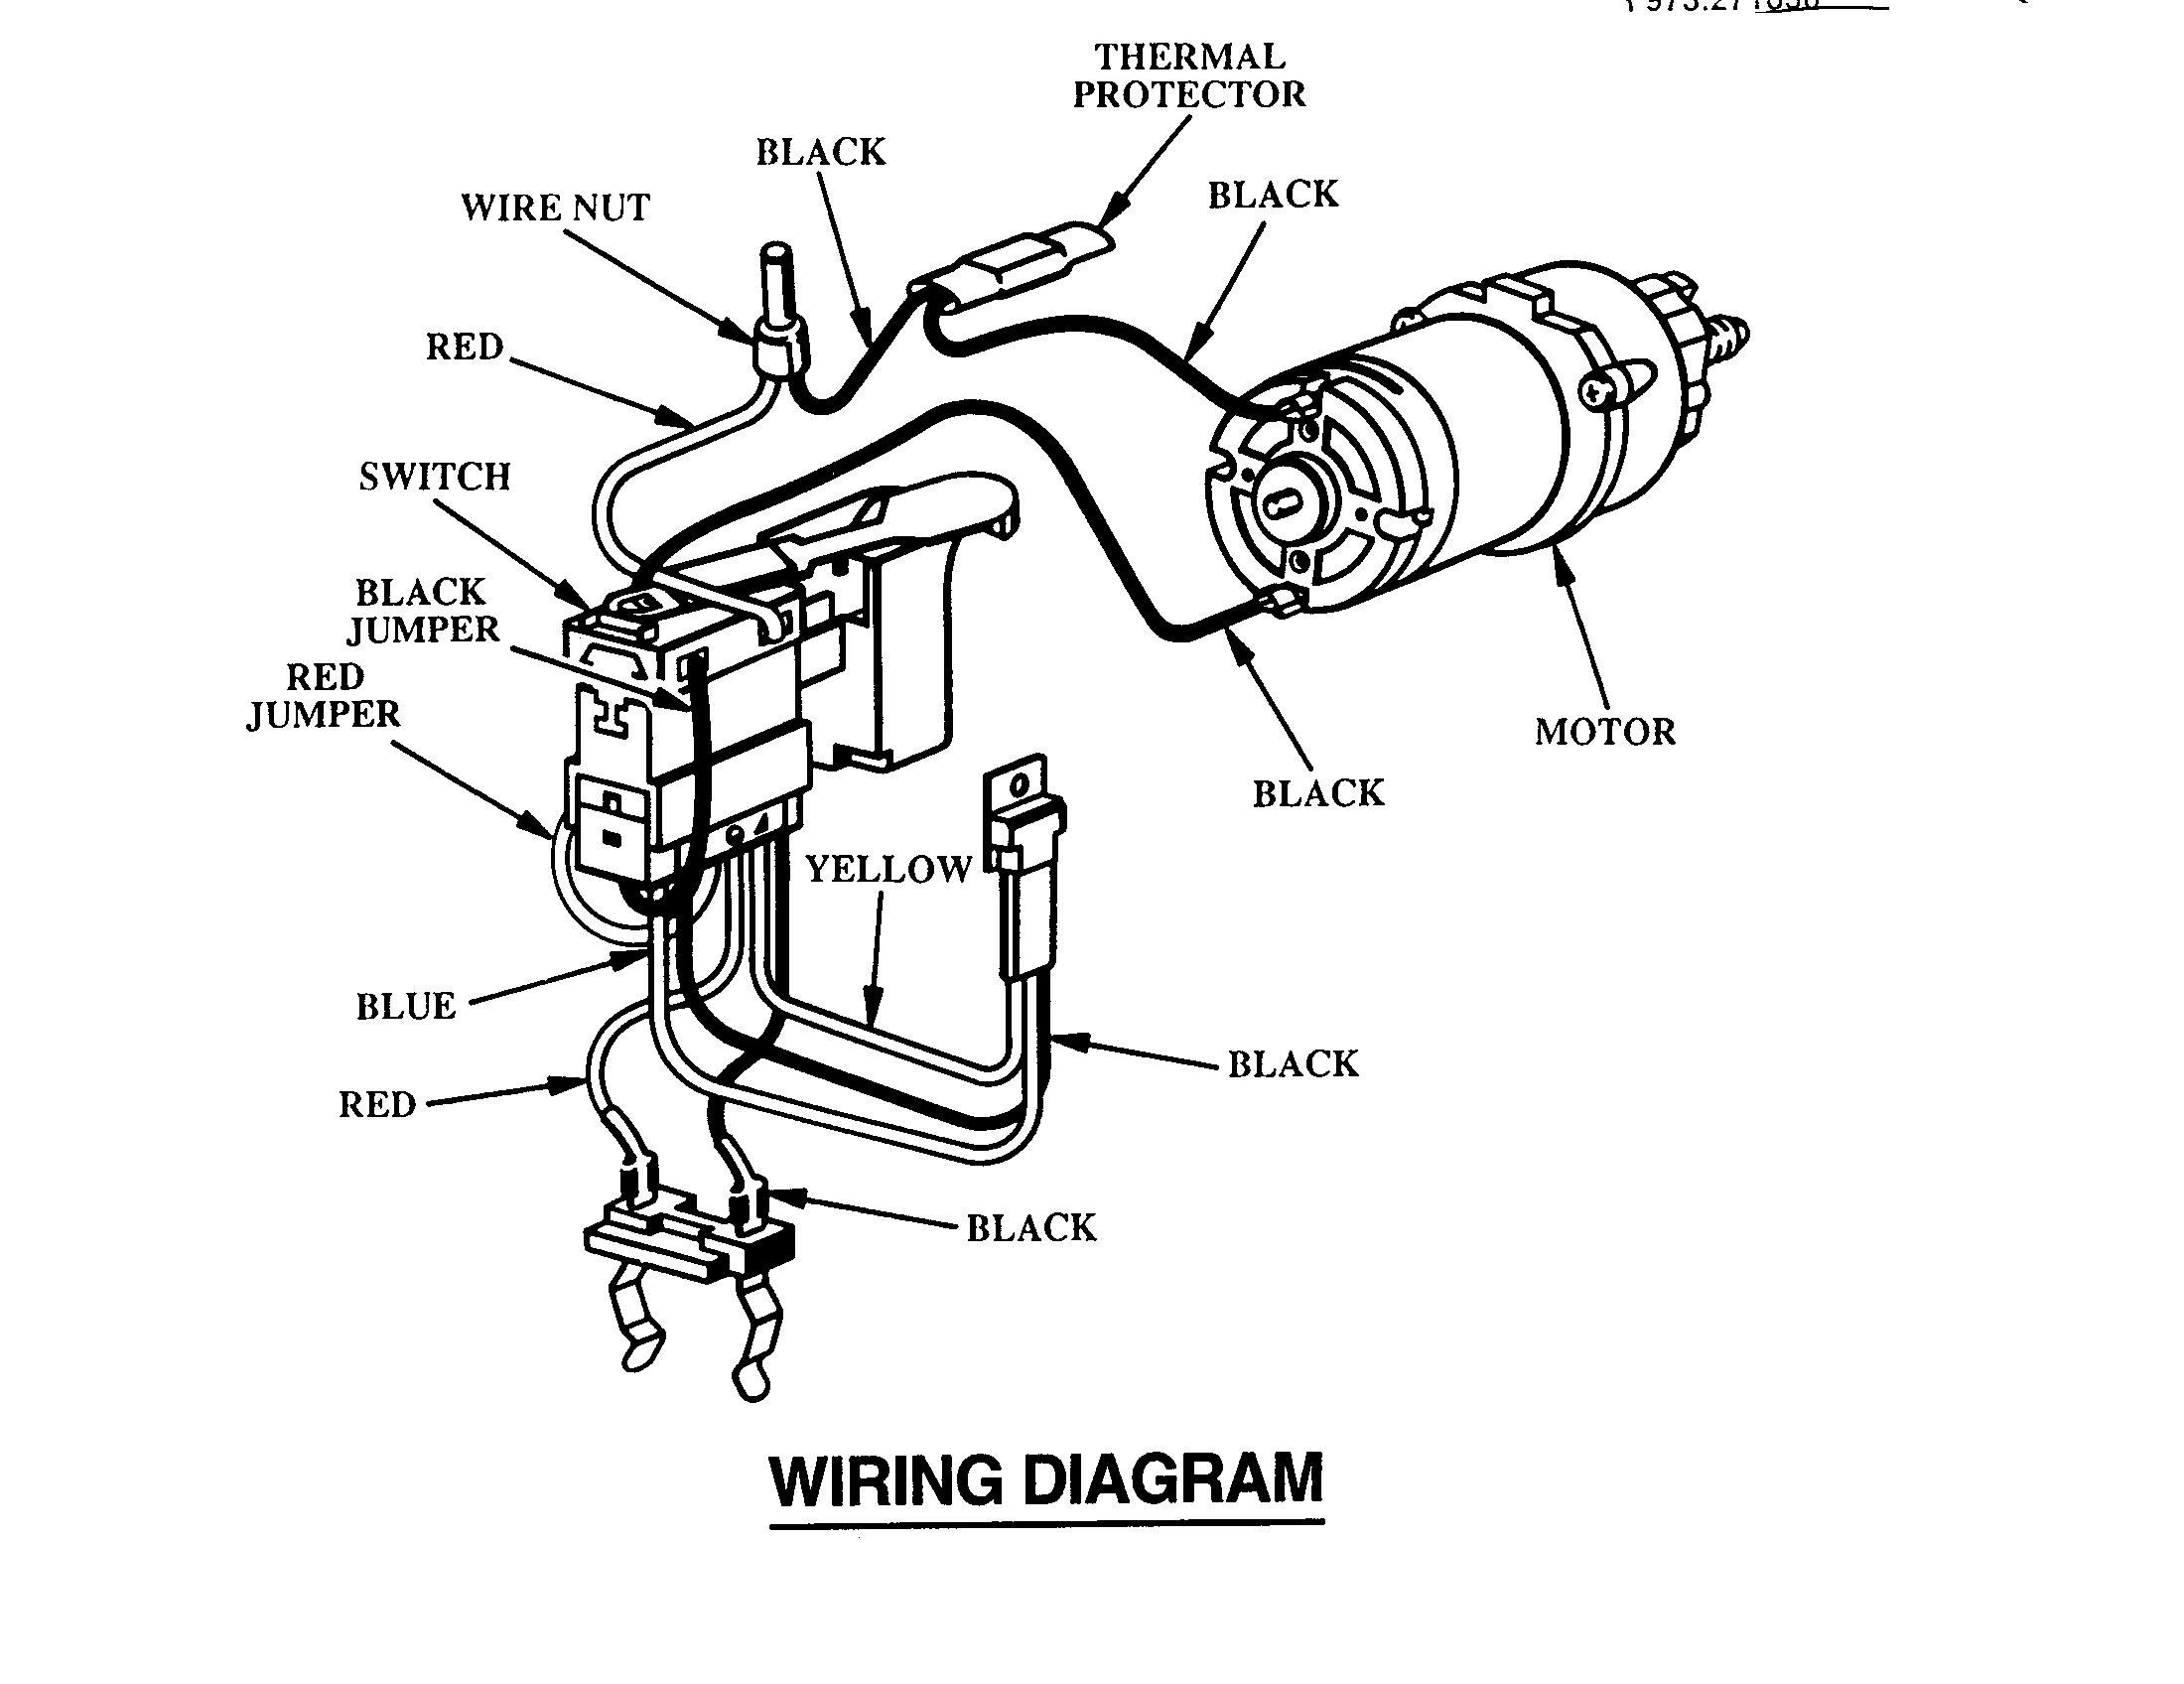 Craftsman model 973271830 drill driver genuine parts rh searspartsdirect craftsman riding mower wiring diagram craftsman